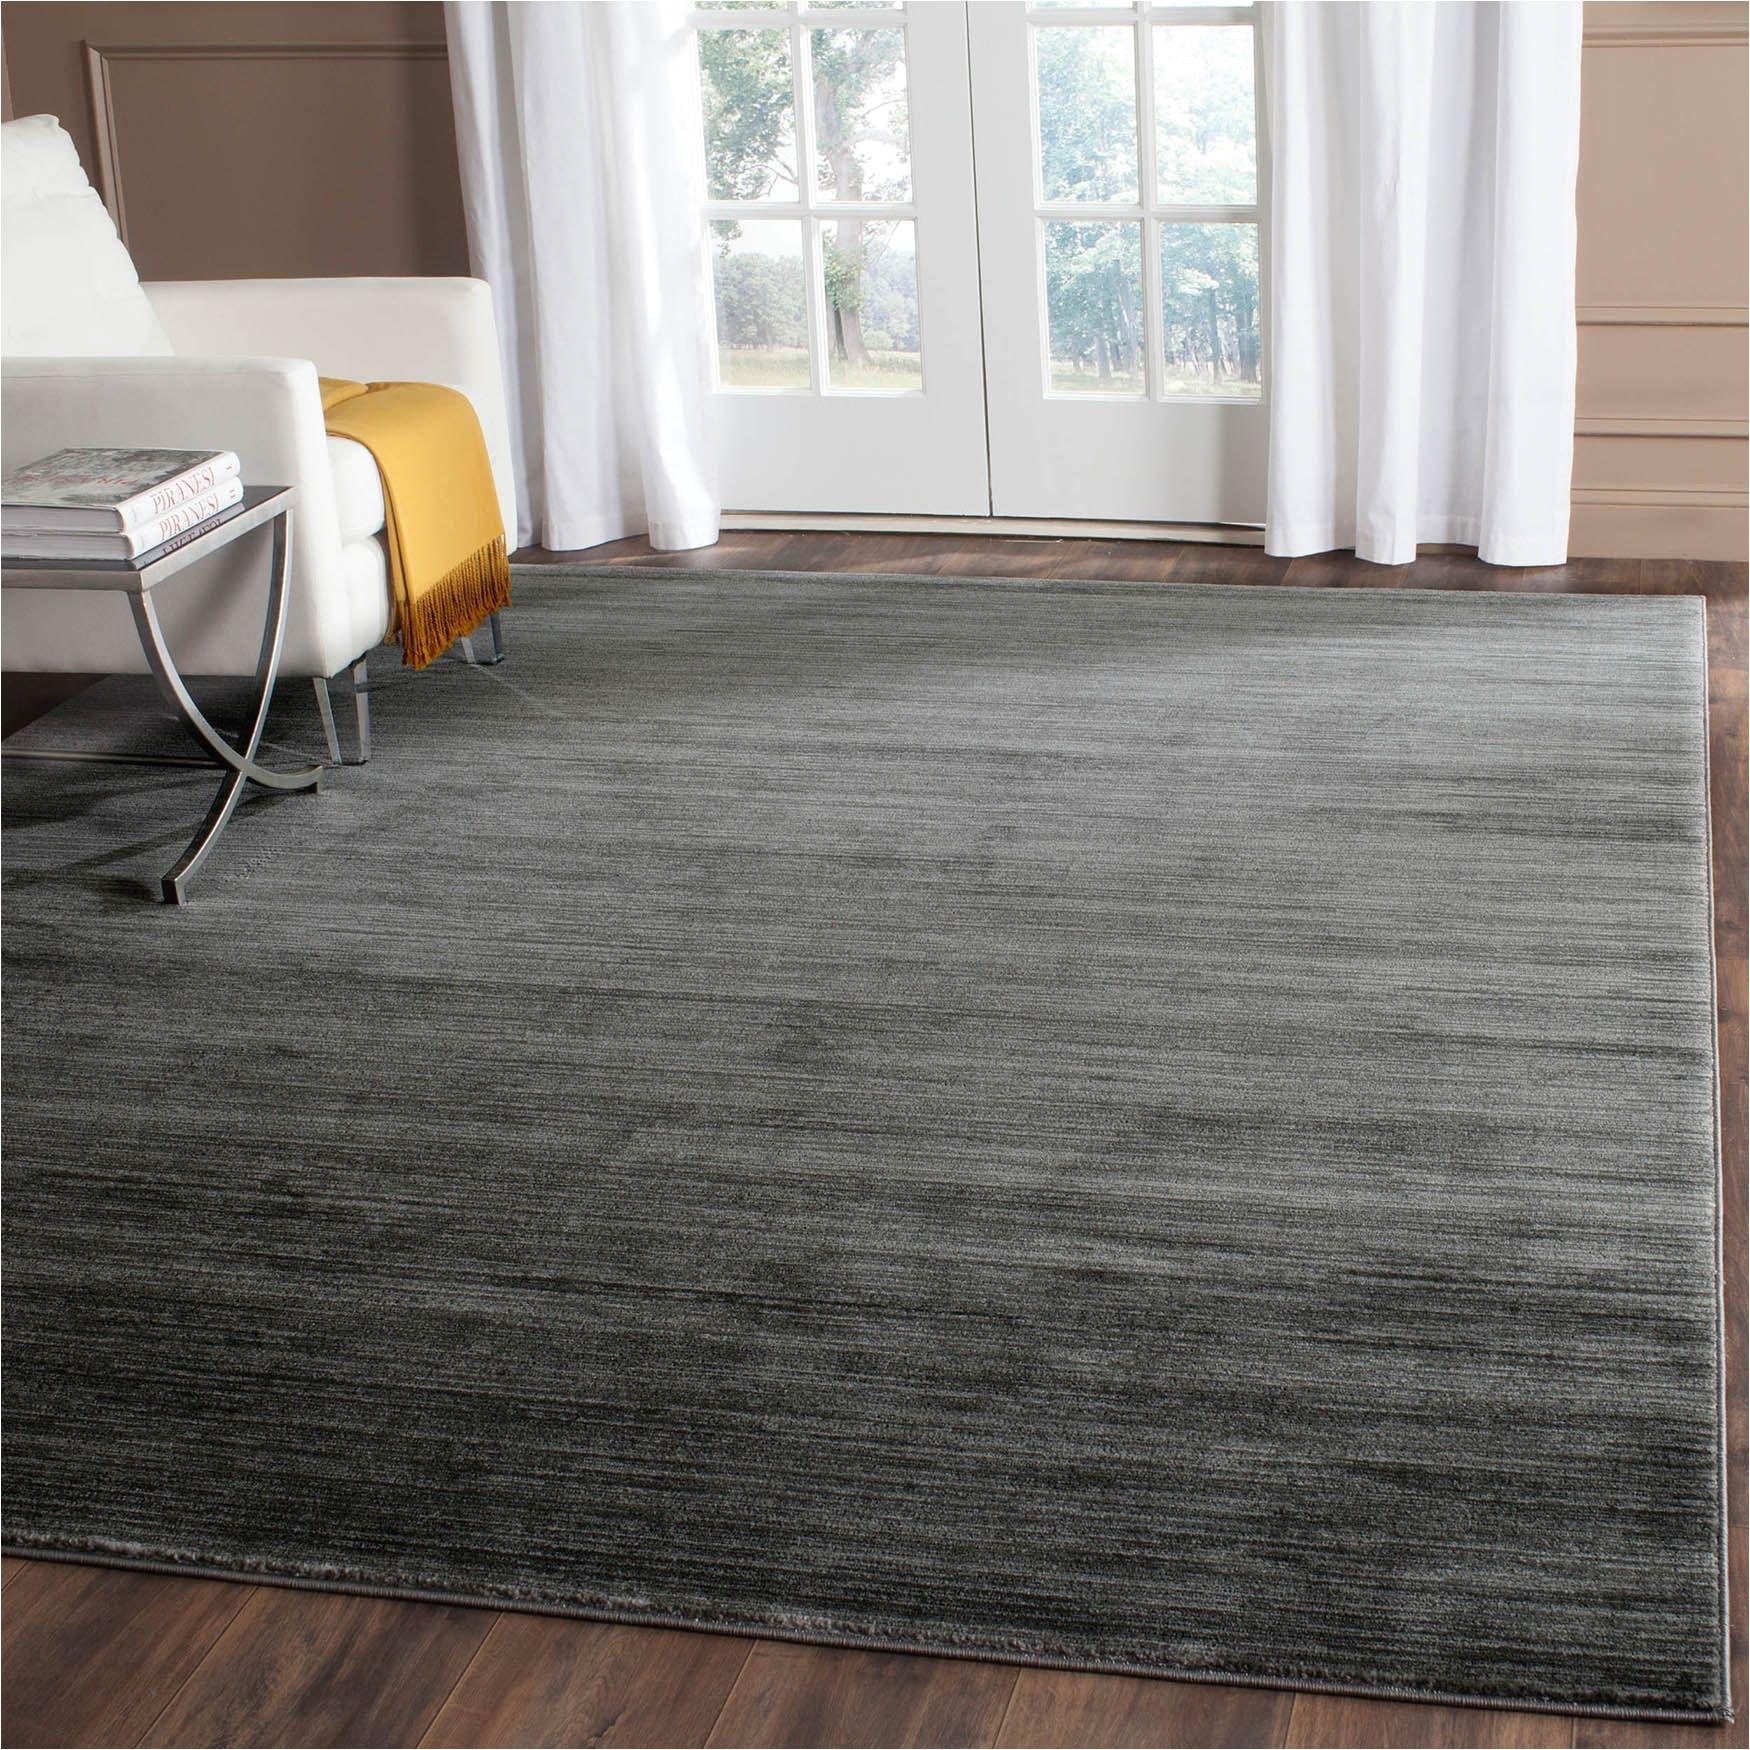 safavieh vision contemporary tonal grey area rug 5 1 x 7 6 vision grey rug size 5 x 8 polypropylene geometric